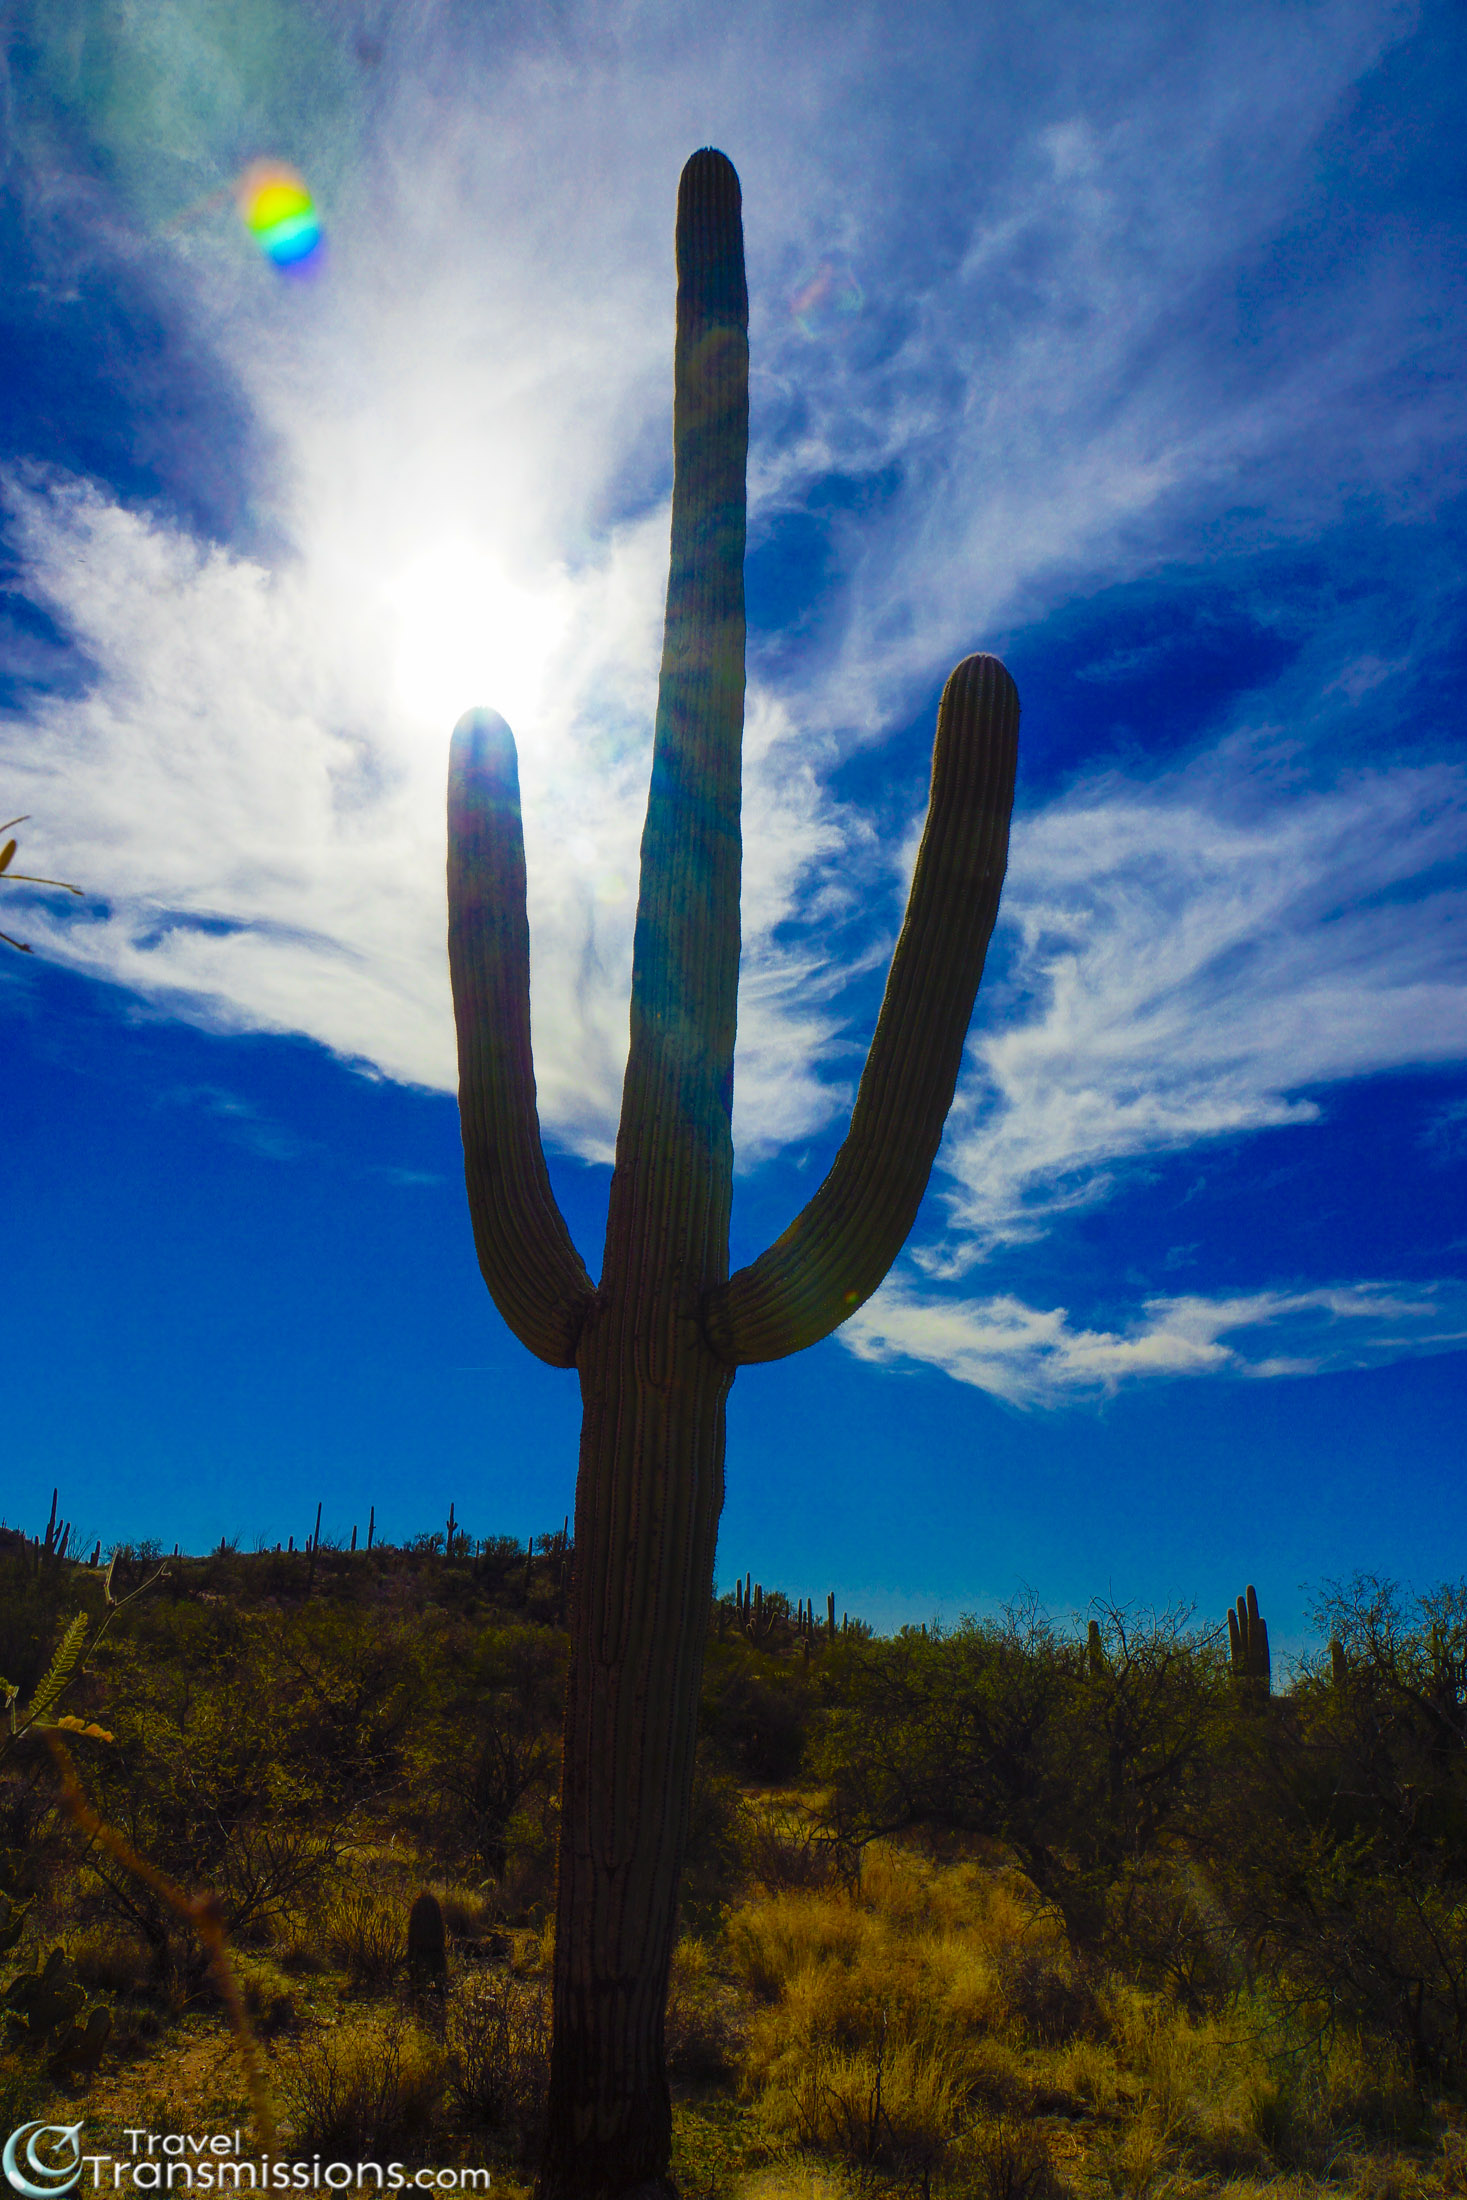 Tucson Saguaro